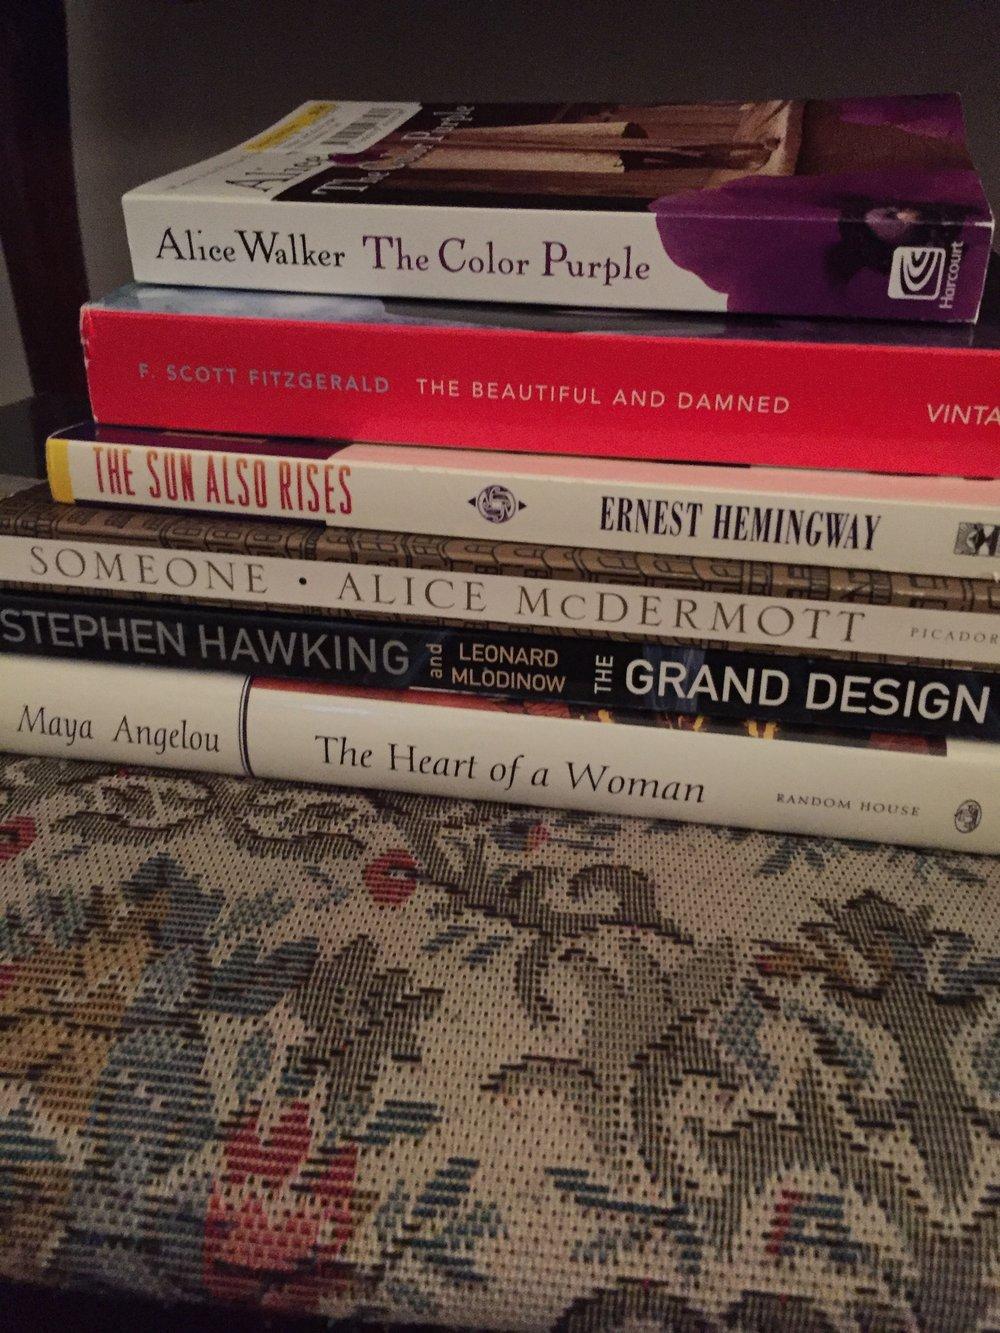 Books always, books everywhere.